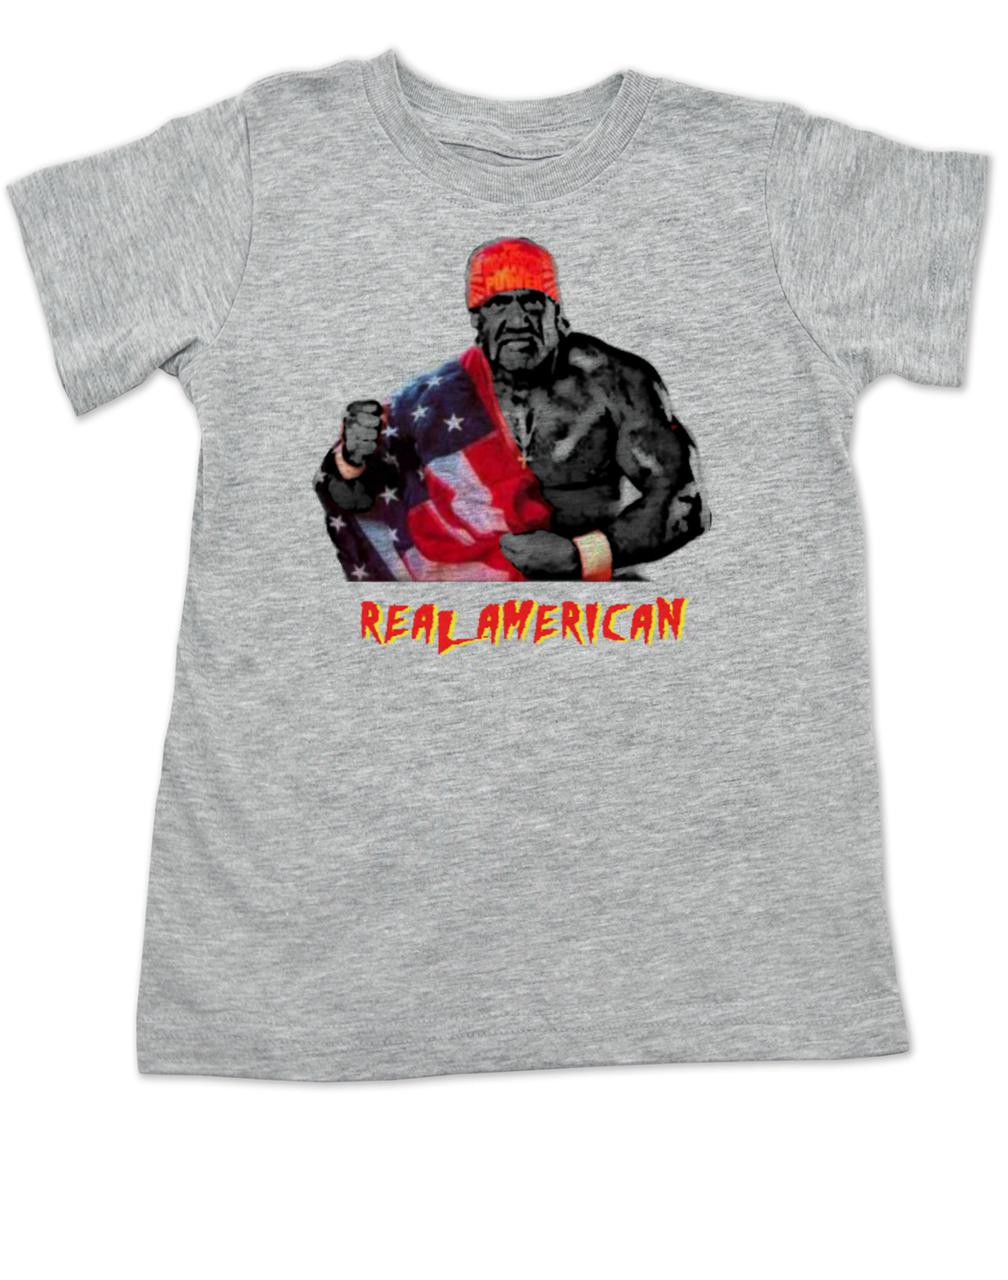 Real American Toddler Shirt Hulk Hogan T Pride